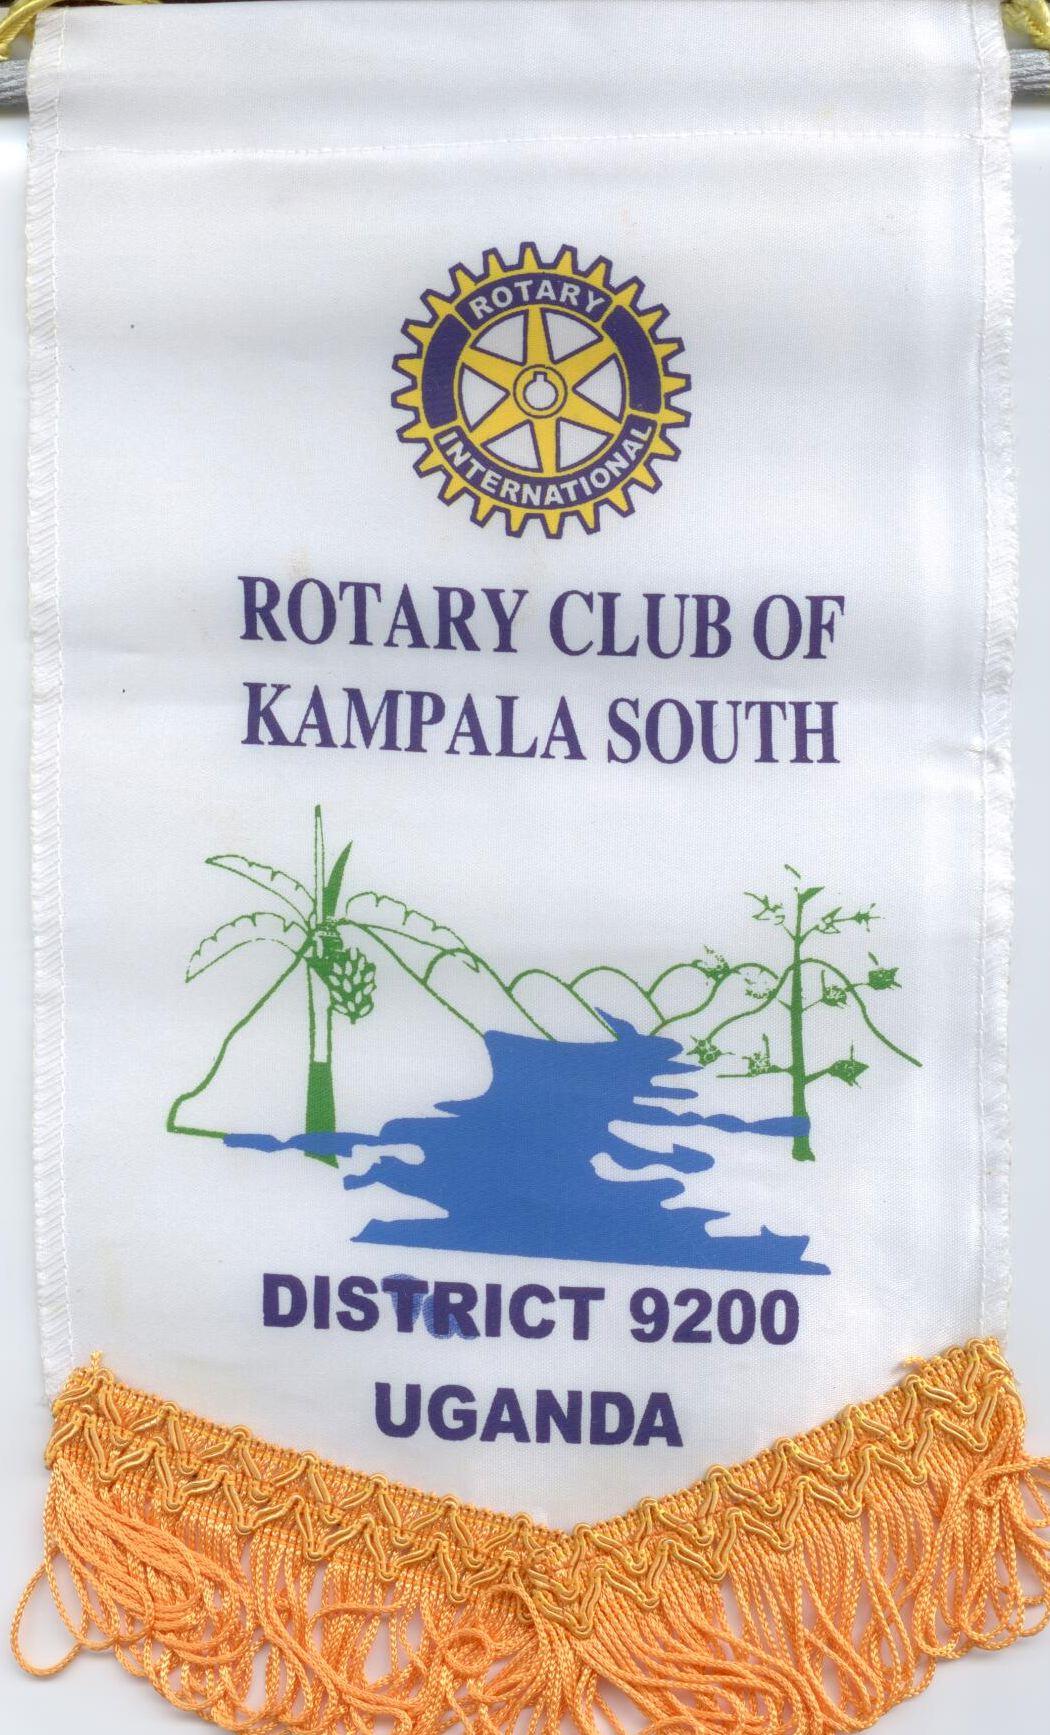 Rotary Club of Kampala South